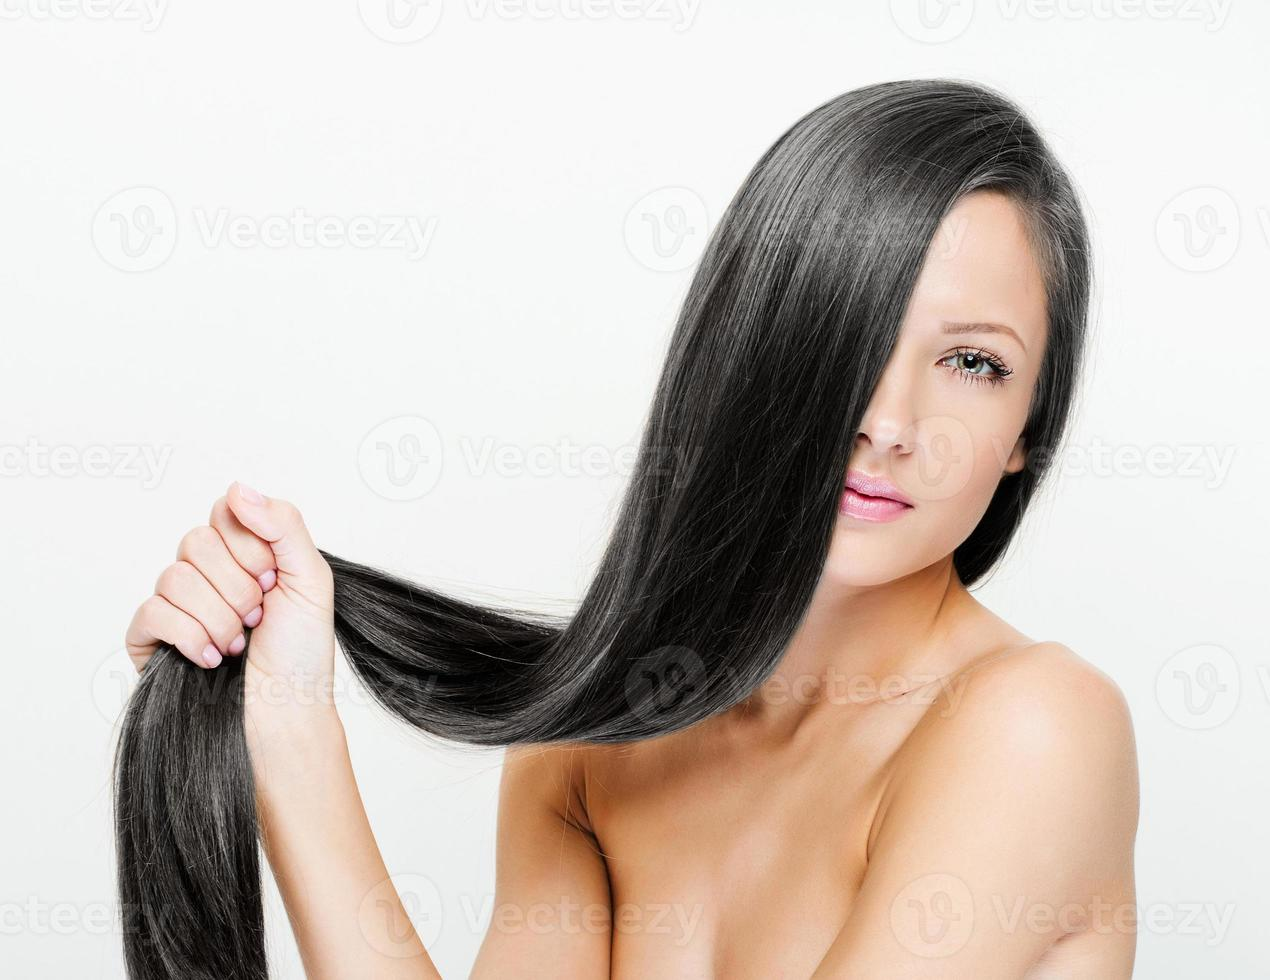 mulher com cabelos longos de beleza foto